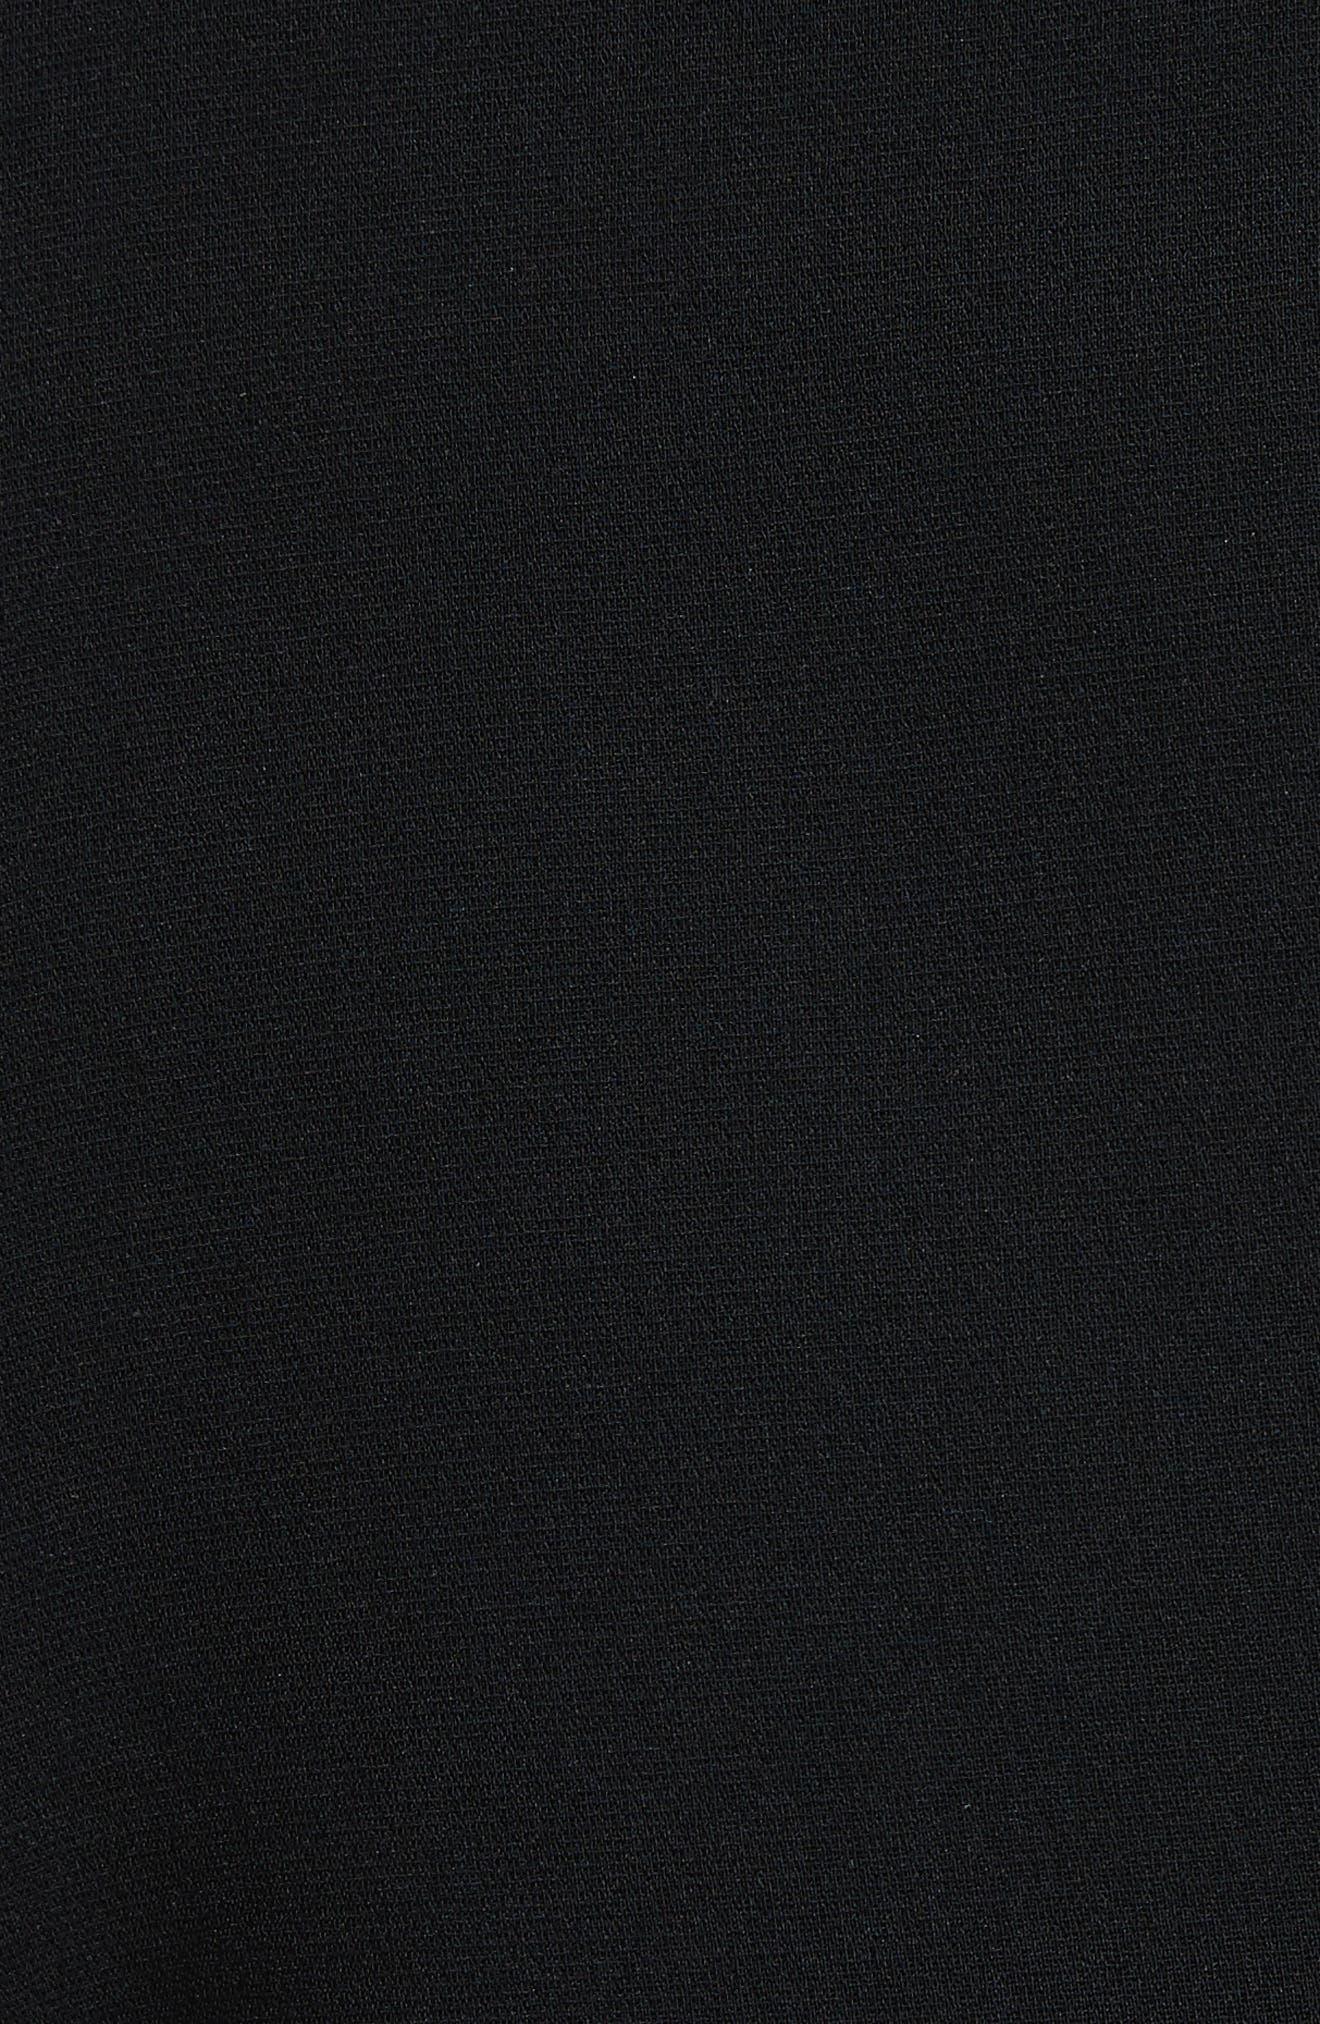 Kenzie Ruffle Side Shorts,                             Alternate thumbnail 5, color,                             001